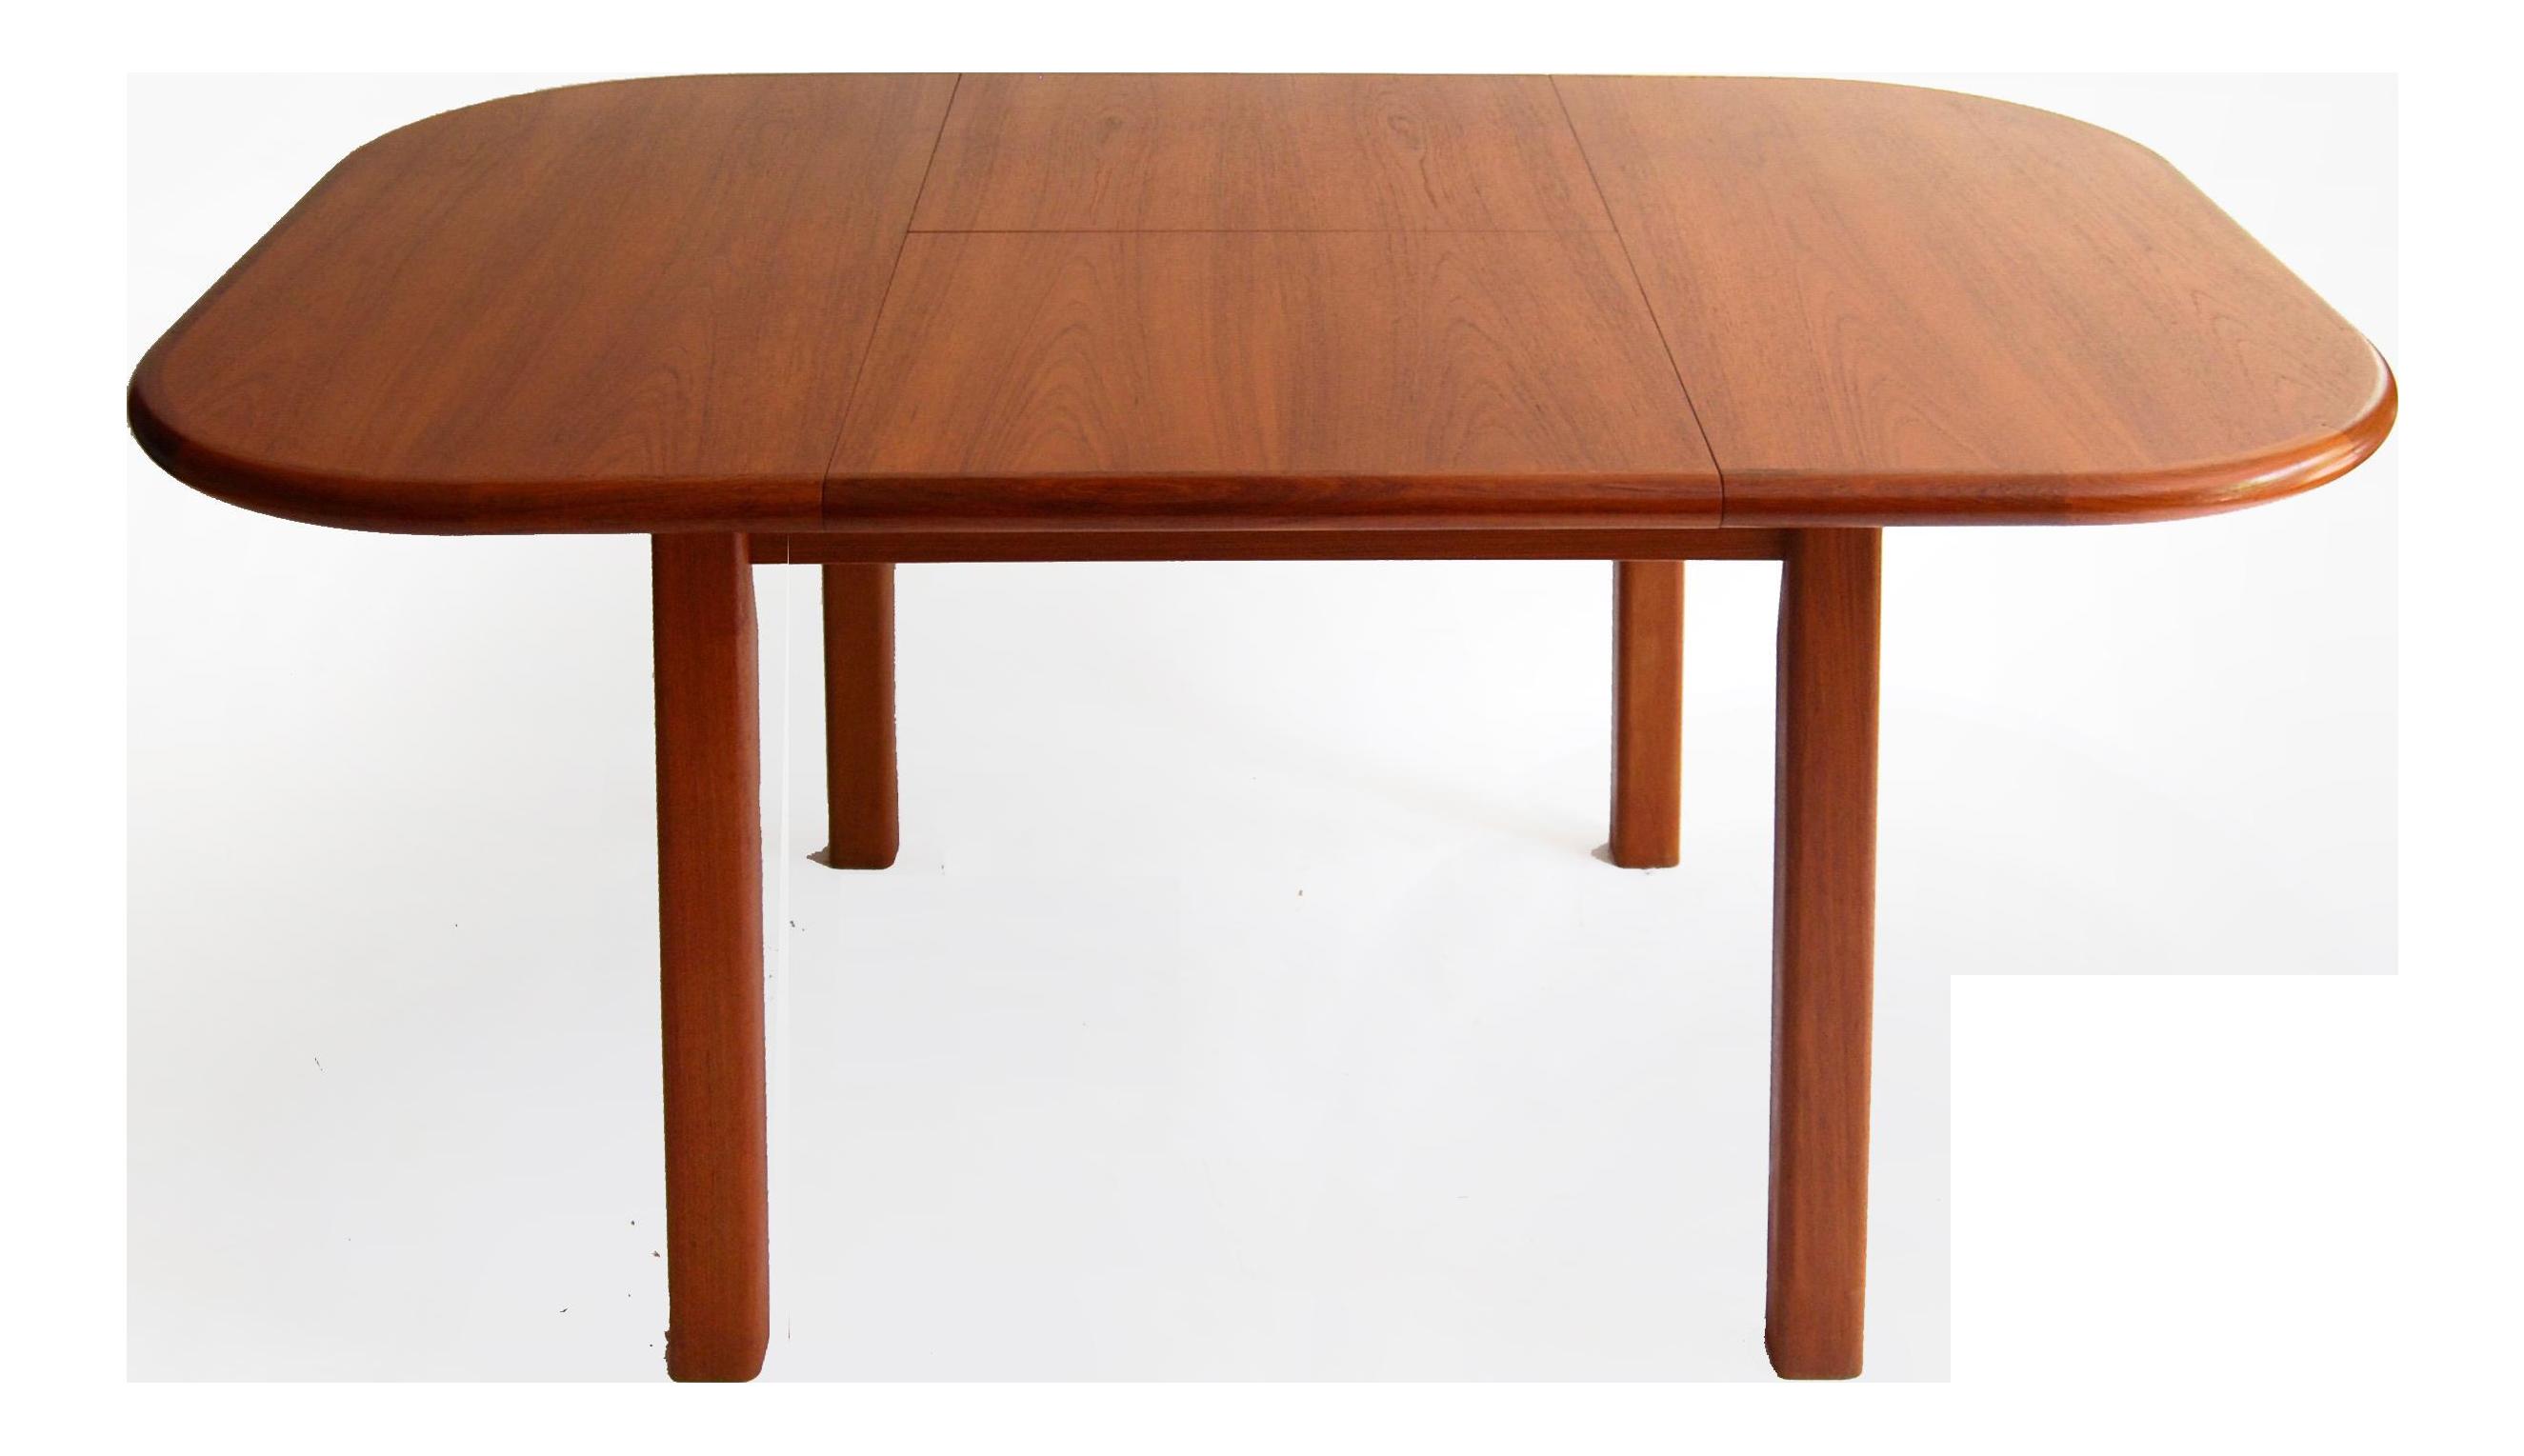 Vintage Mid Century Modern Teak Extending Dining Table by D Scan